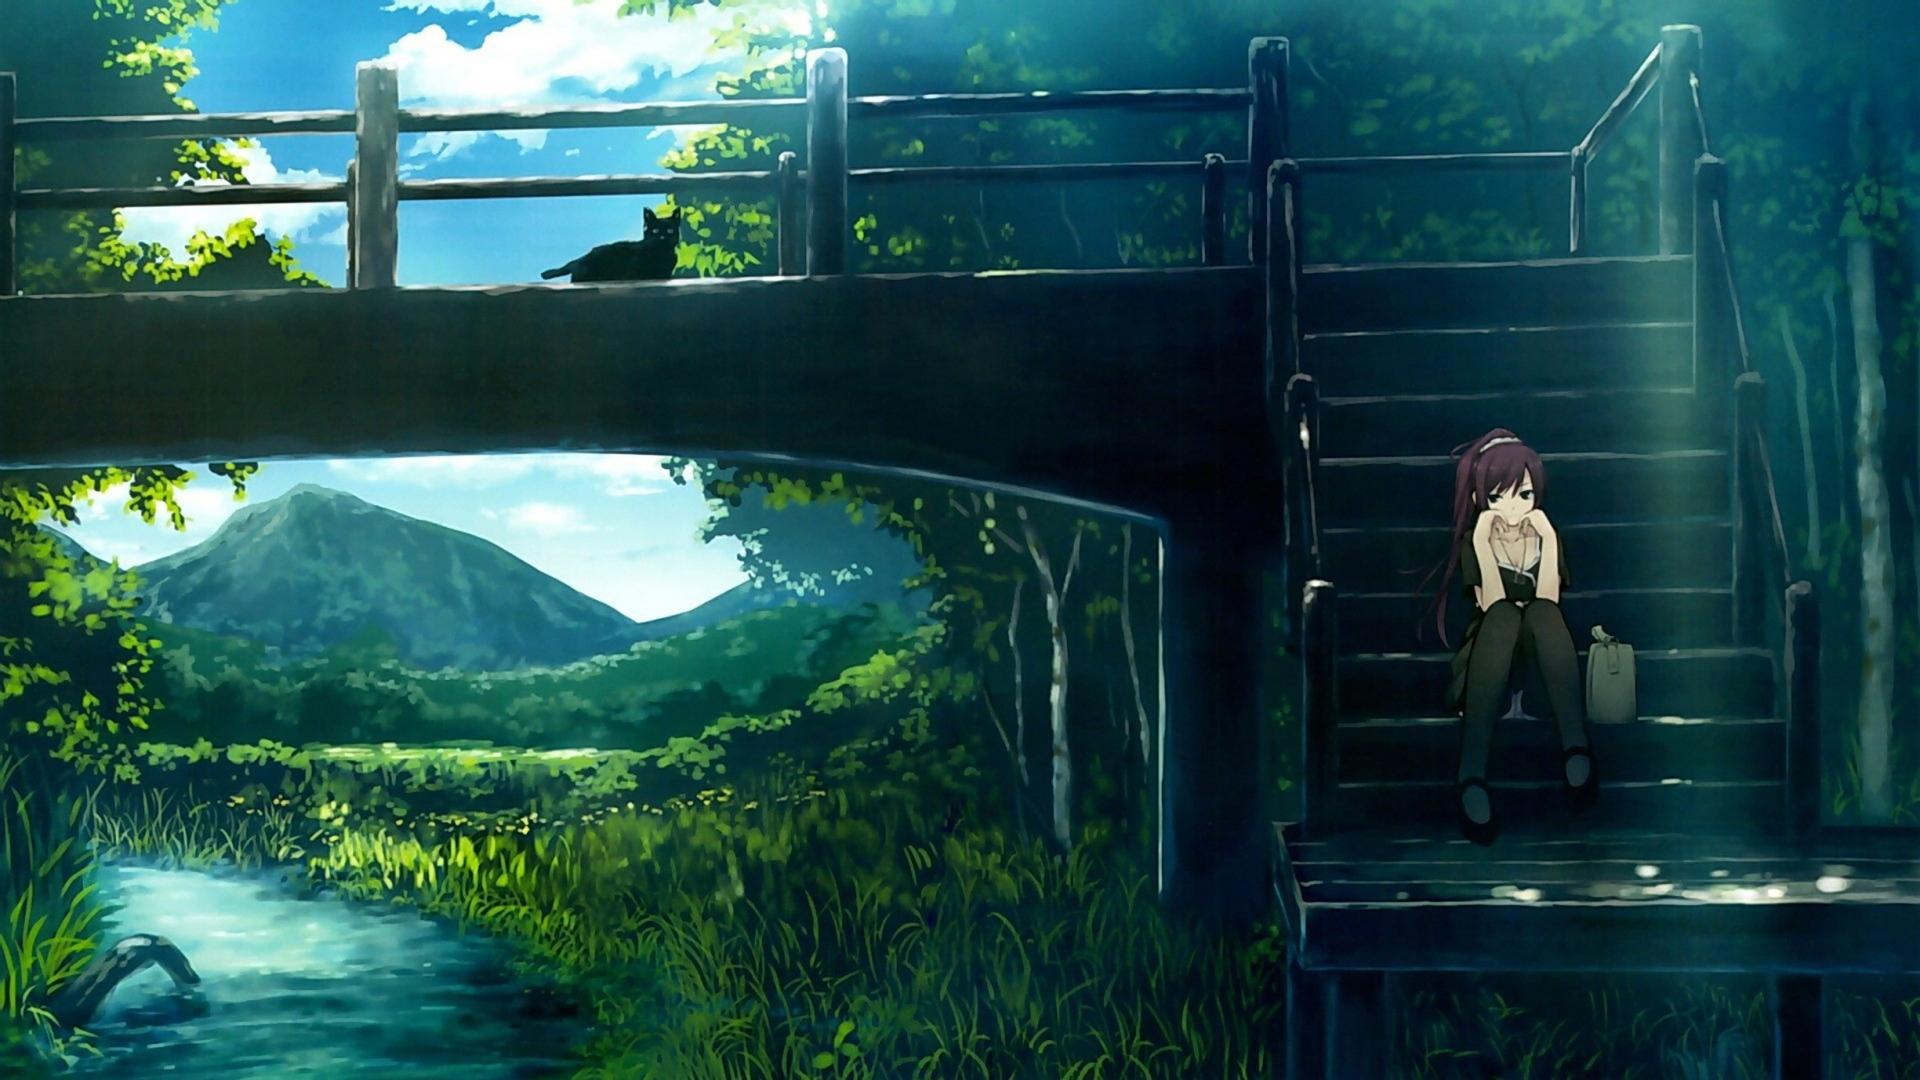 Old Anime Wallpaper's (Full-HD) - 16.06.14 file - Mod DB